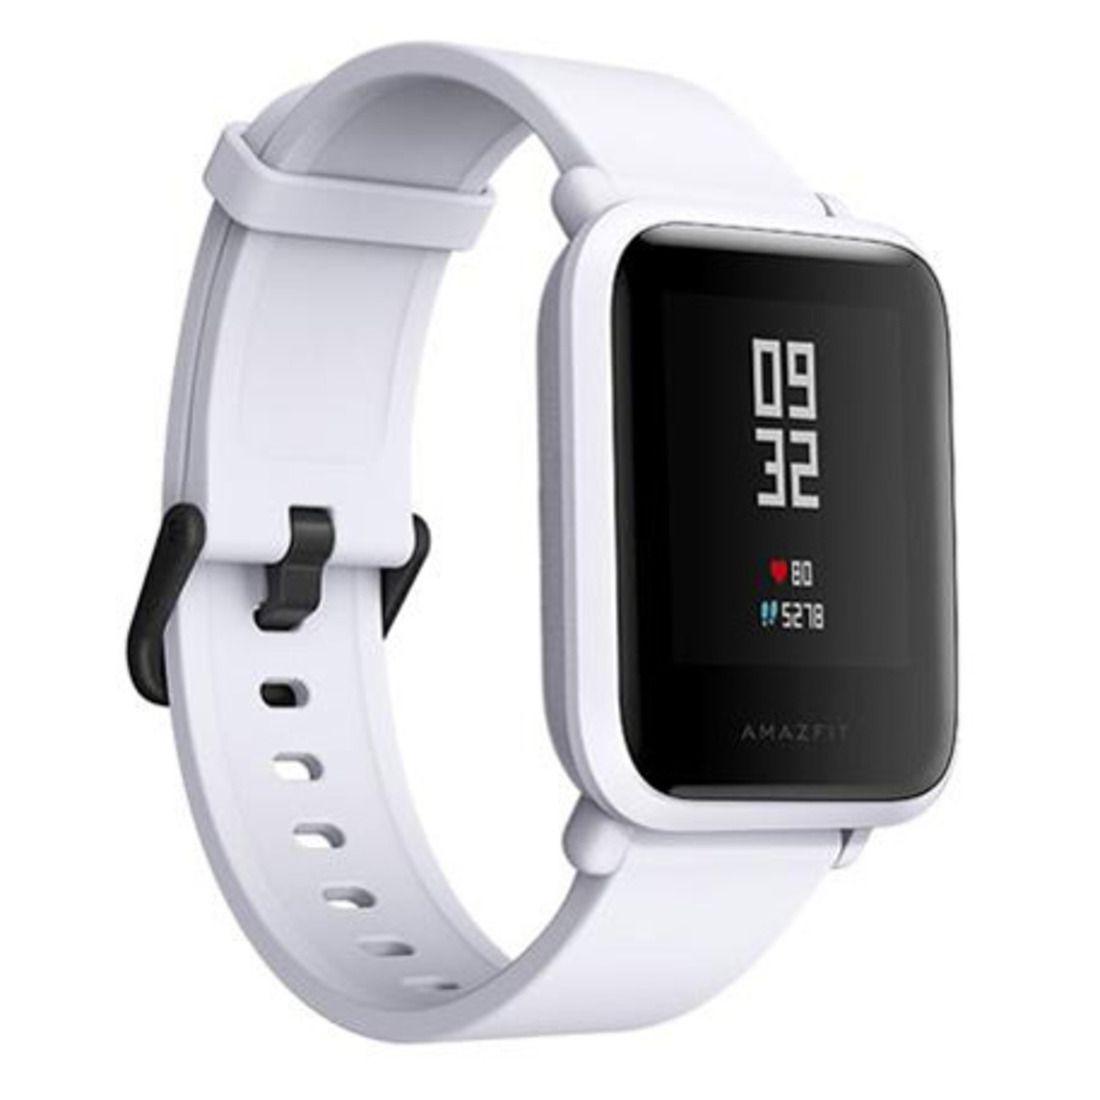 Smartwatch Relogio Amazfit Bip - Branco